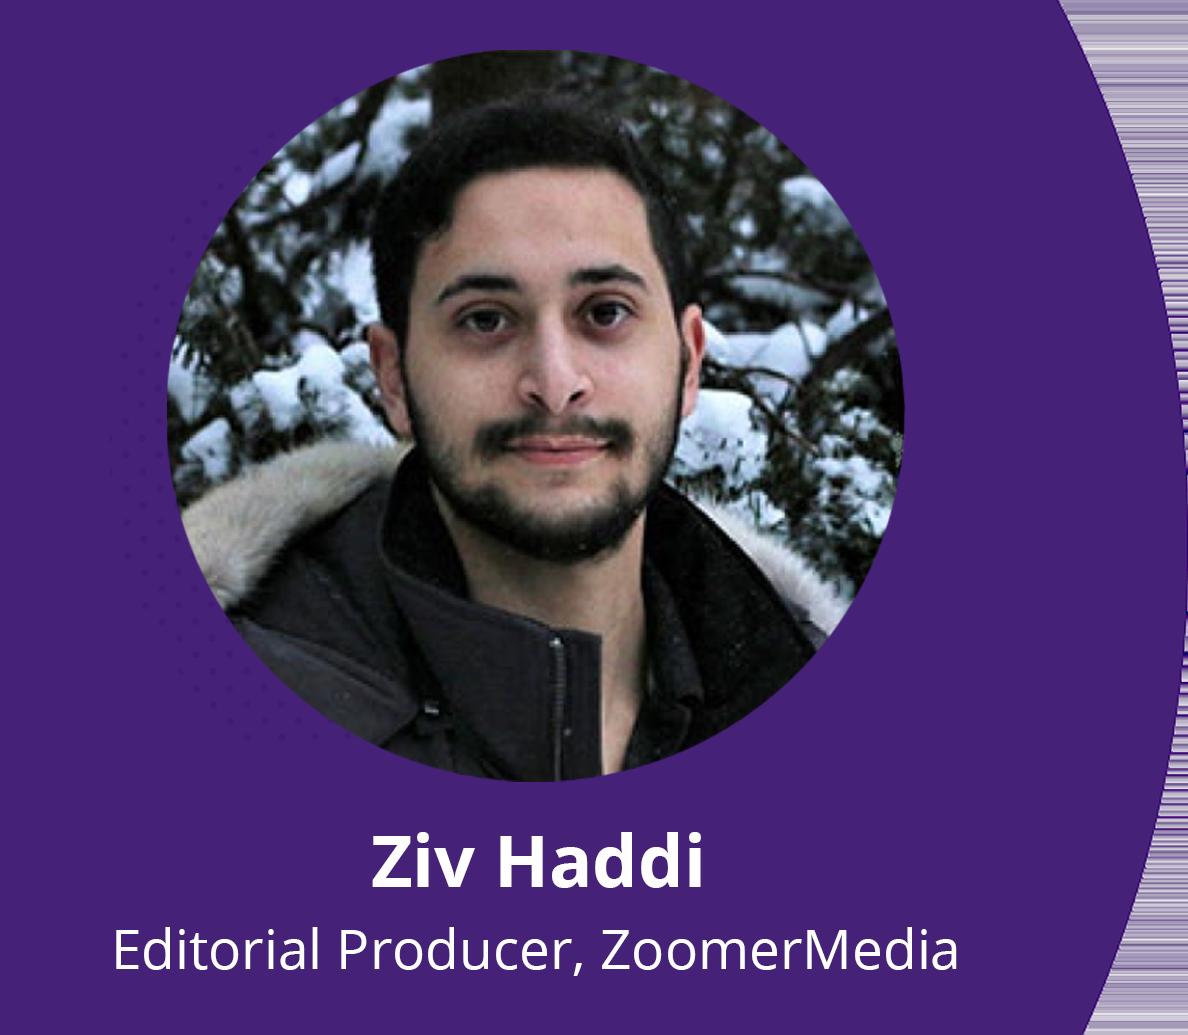 Ziv Haddi, Editorial Producer, ZoomerMedia Limited